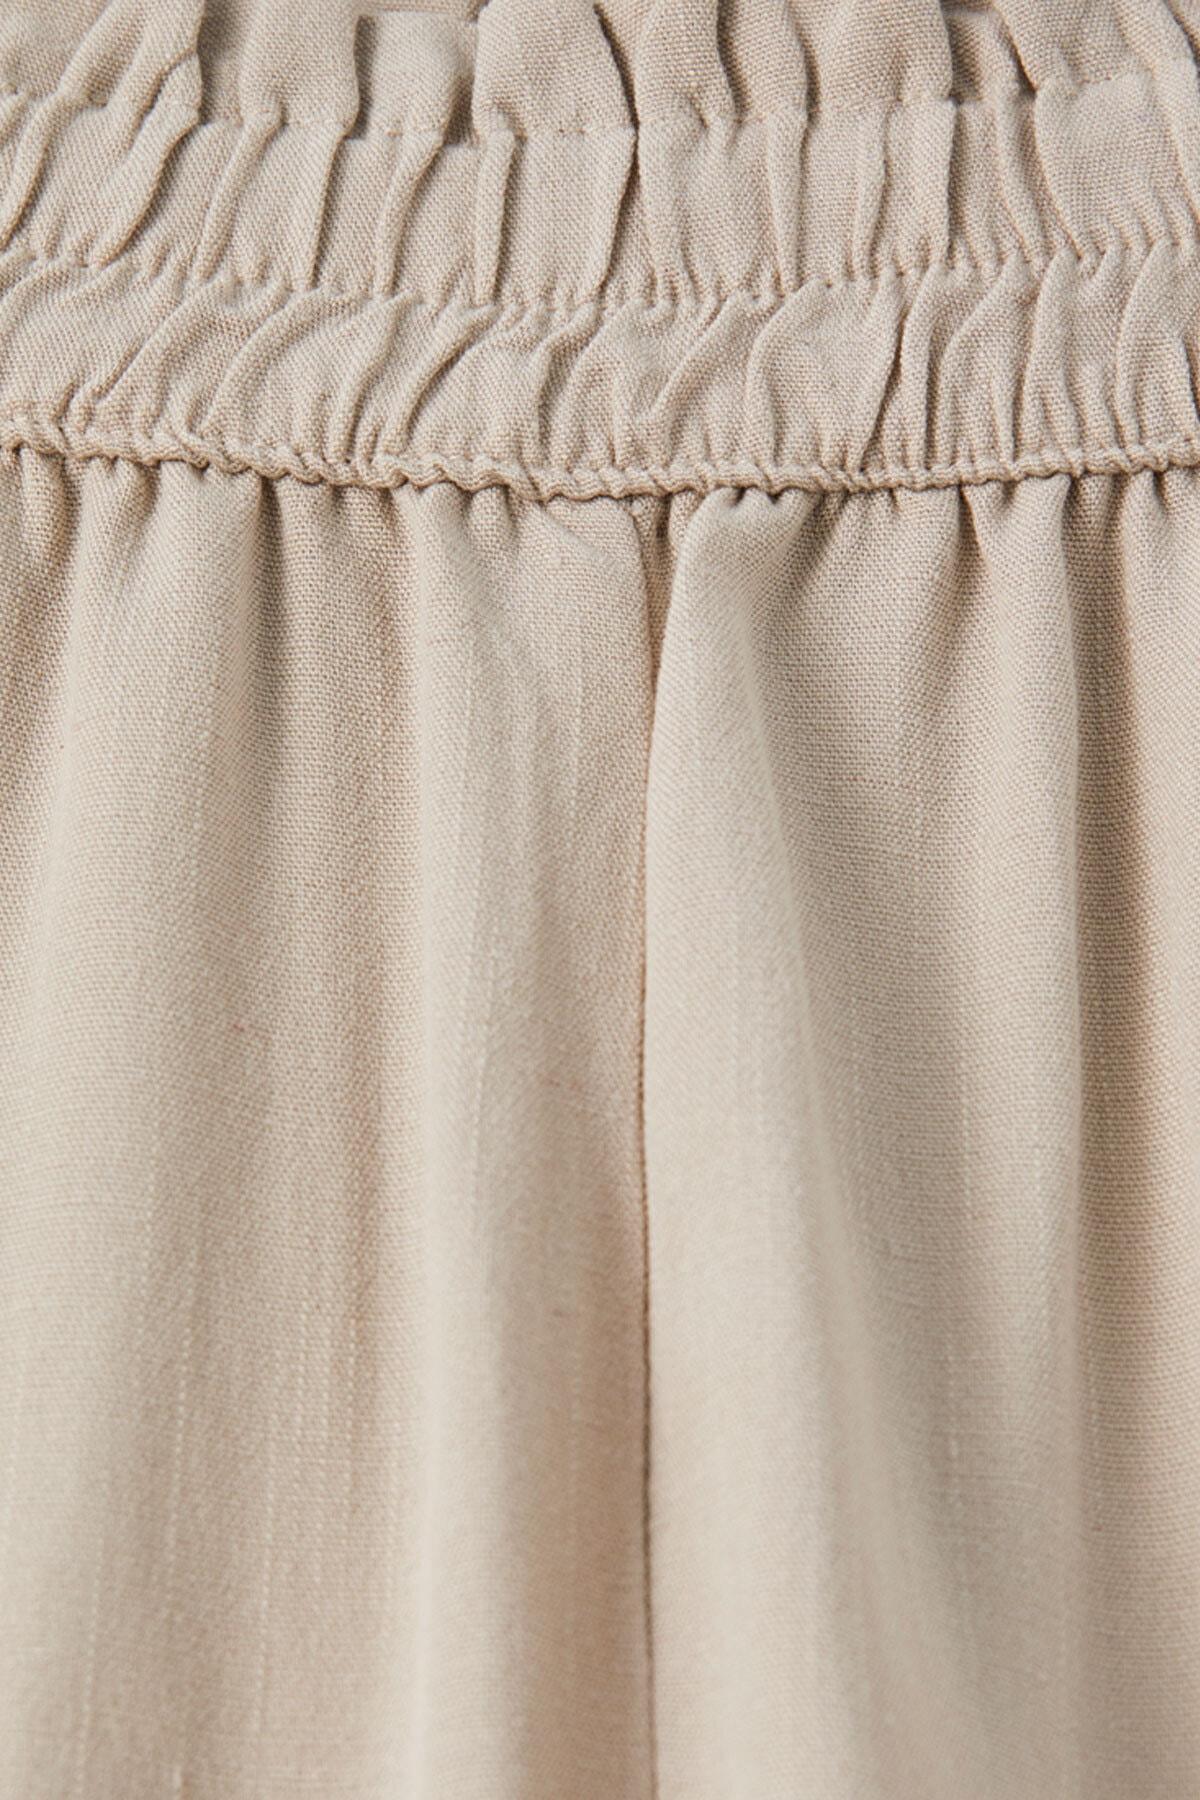 Pull & Bear Kadın Kum Rengi Elastik Belli Keten Pantolon 05671307 2